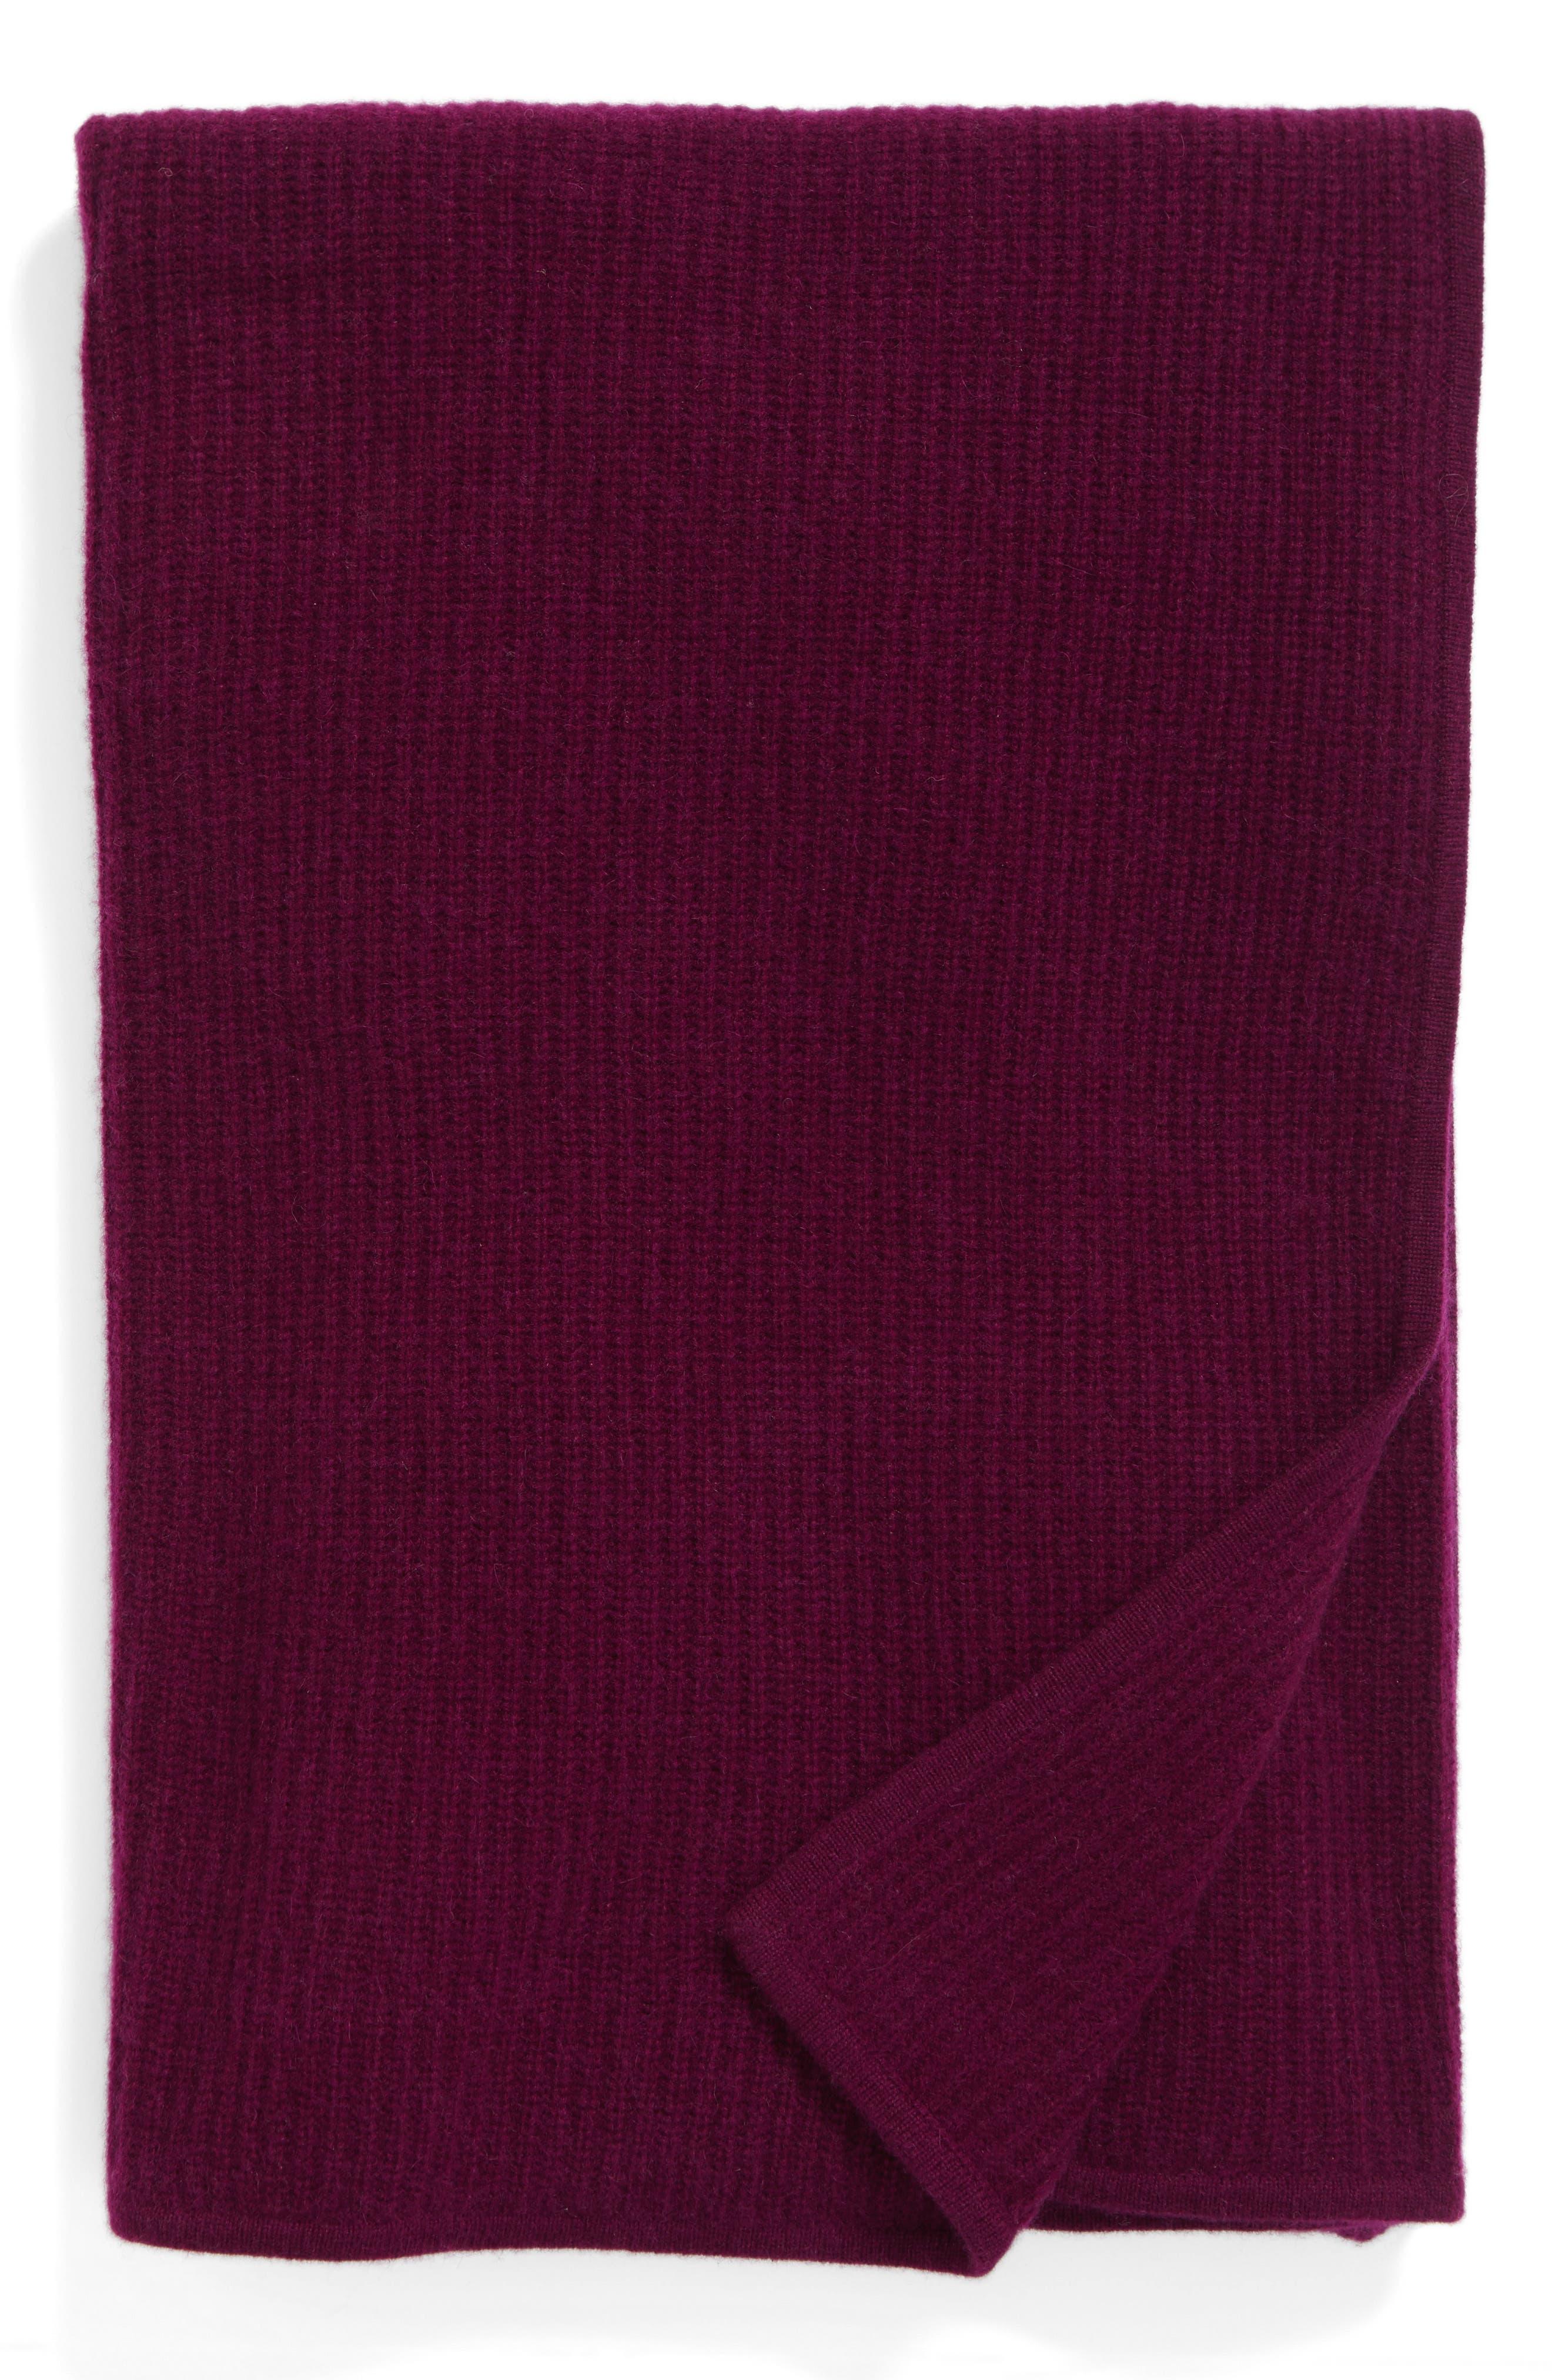 Lattice Cashmere Throw Blanket,                         Main,                         color, Purple Dark